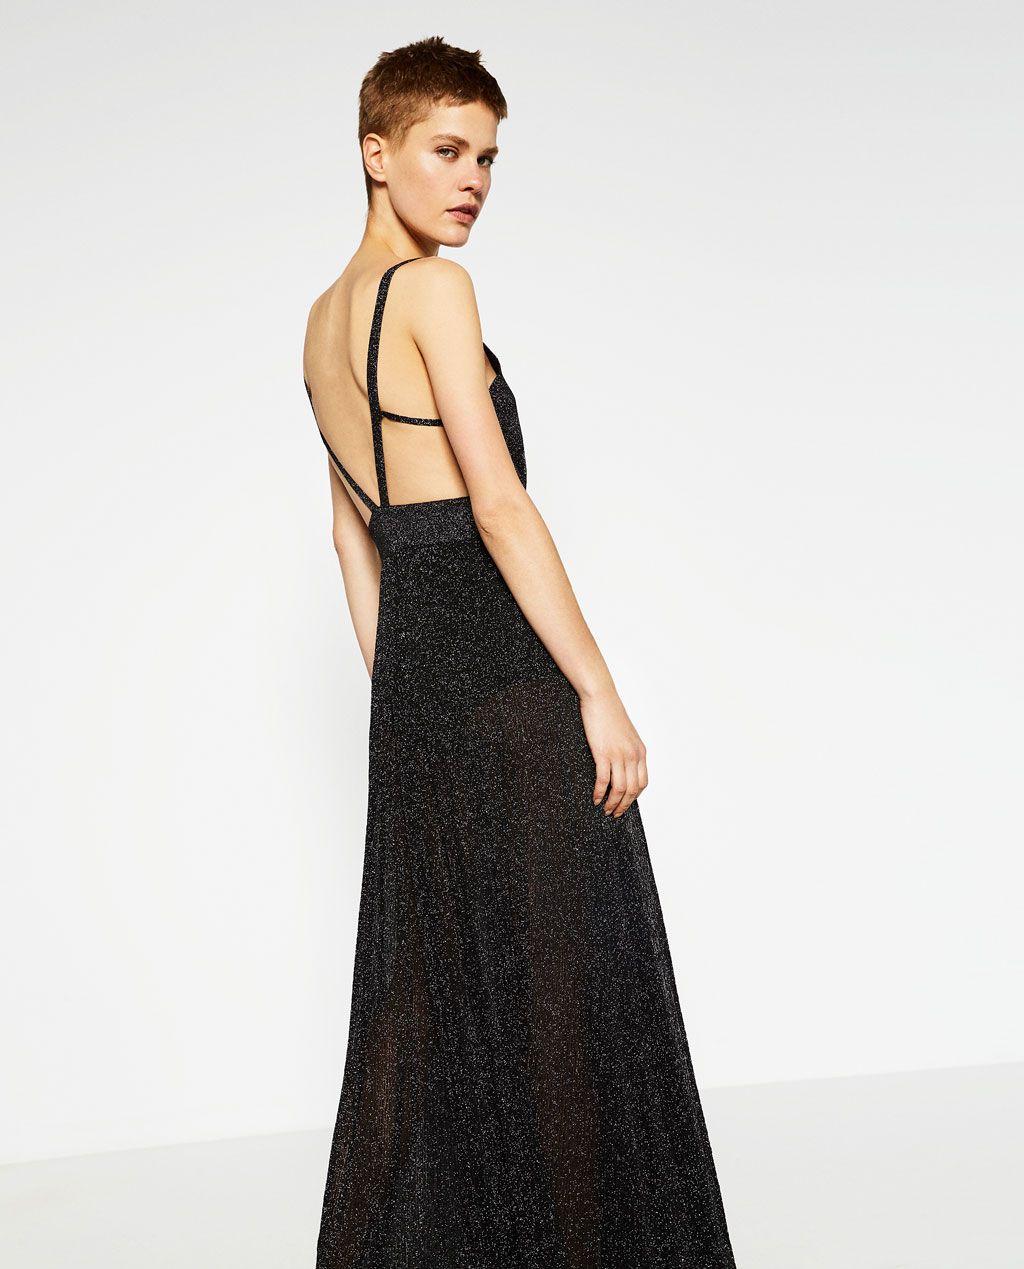 VESTIDO LARGO LIMITED EDITION-Knit dress-MUJER-ÚLTIMA SEMANA | ZARA España